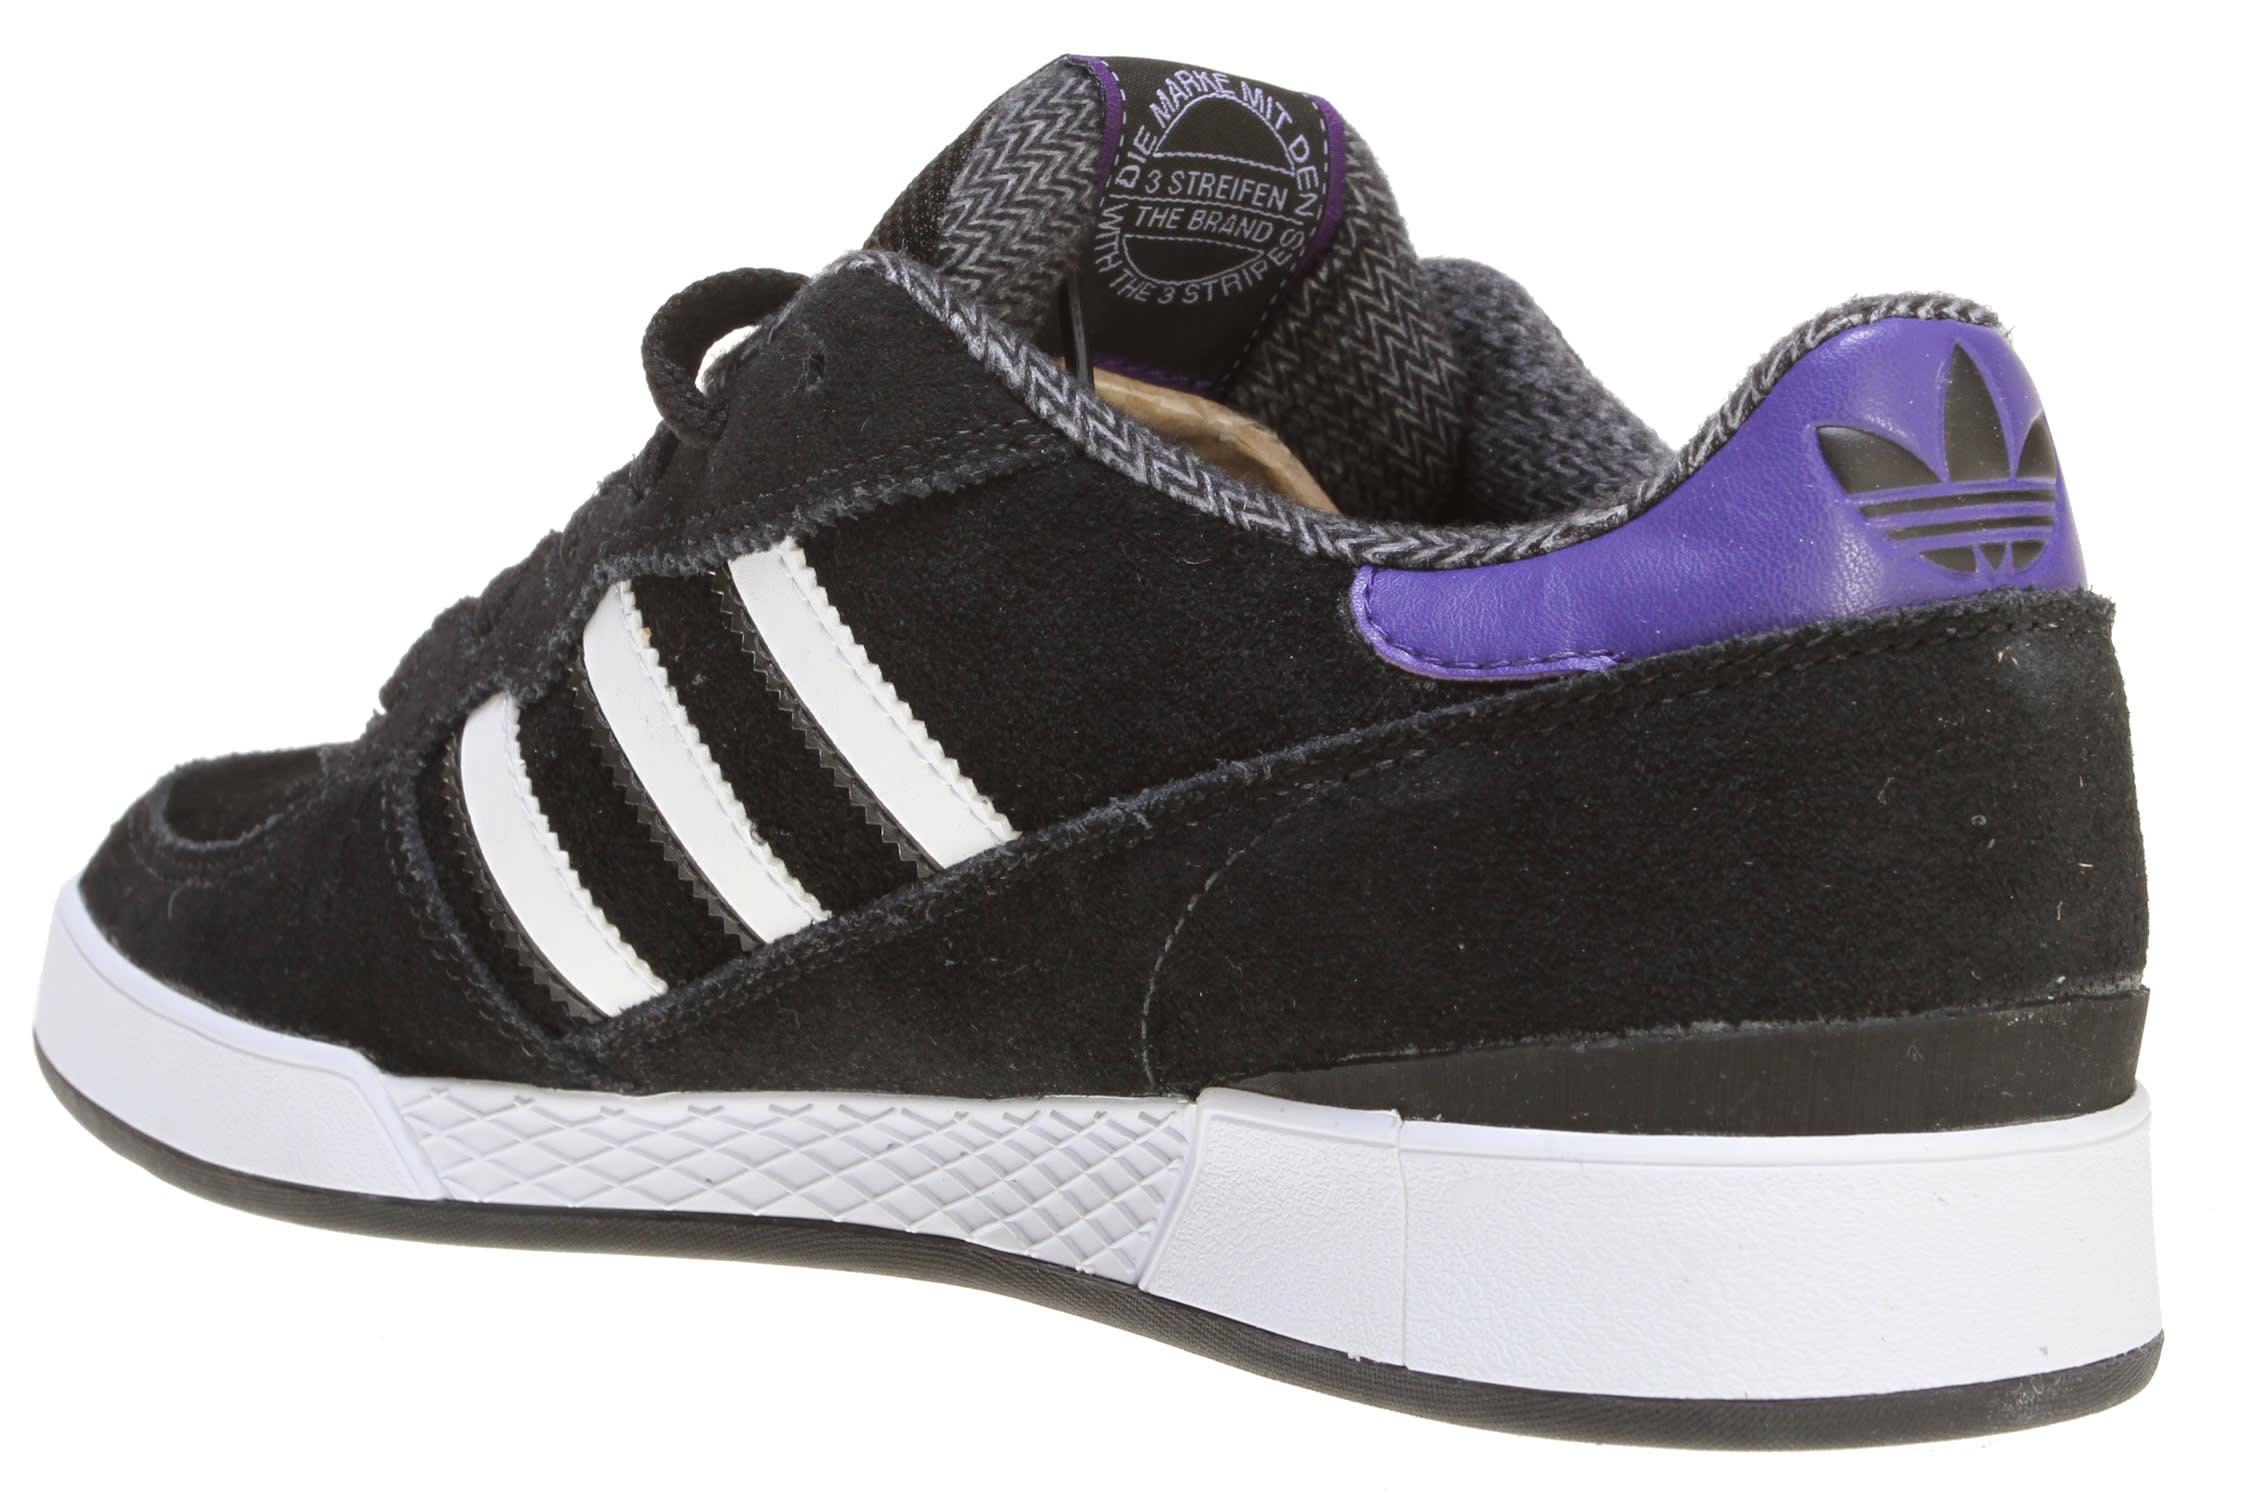 25181f73c8 Adidas Silas Skate Shoes - thumbnail 3